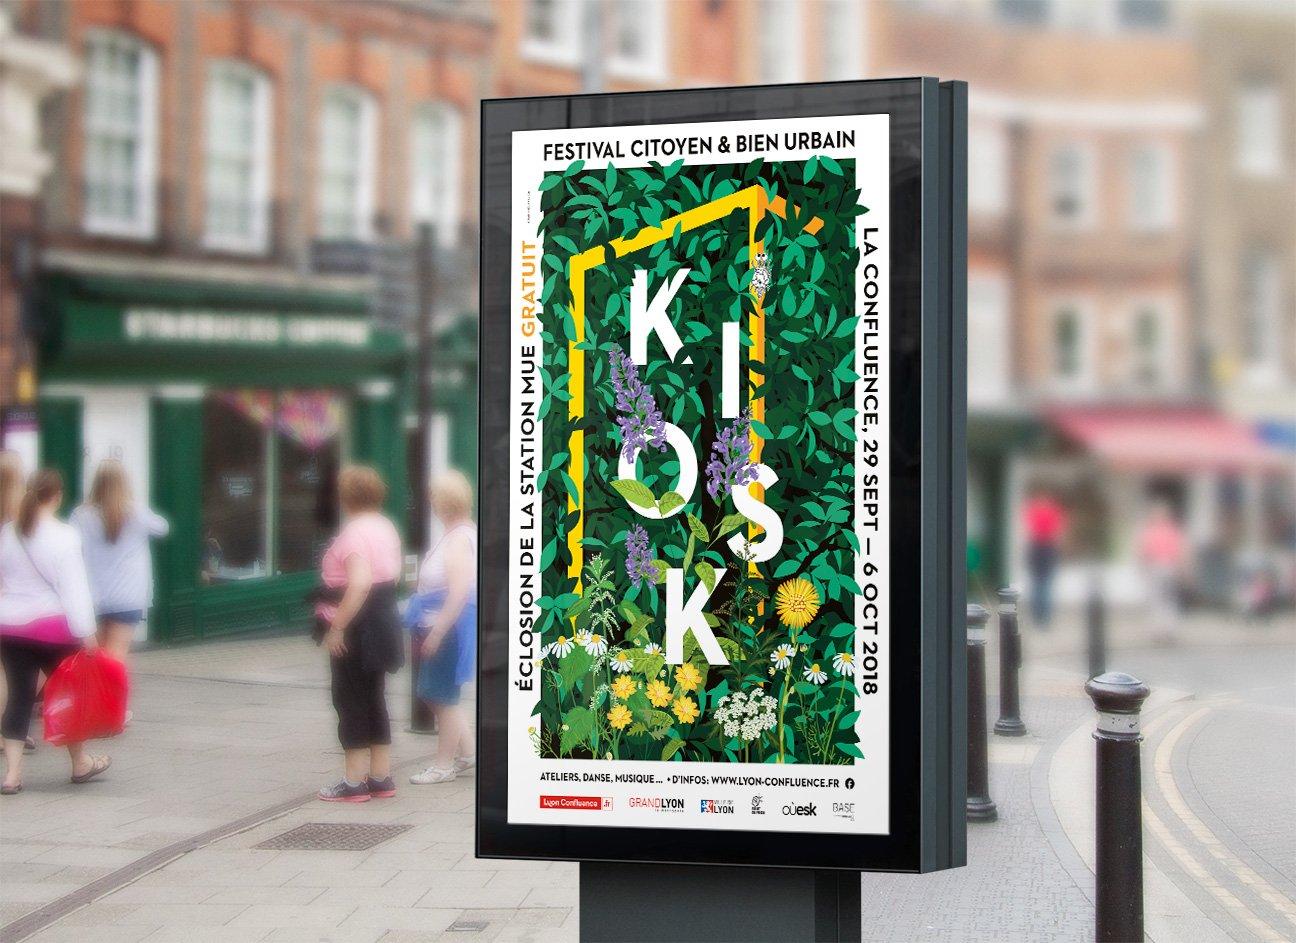 Fabien_cuffel_affiche_festival_Kiosk_lyon_confluence_2018-jcdecaux